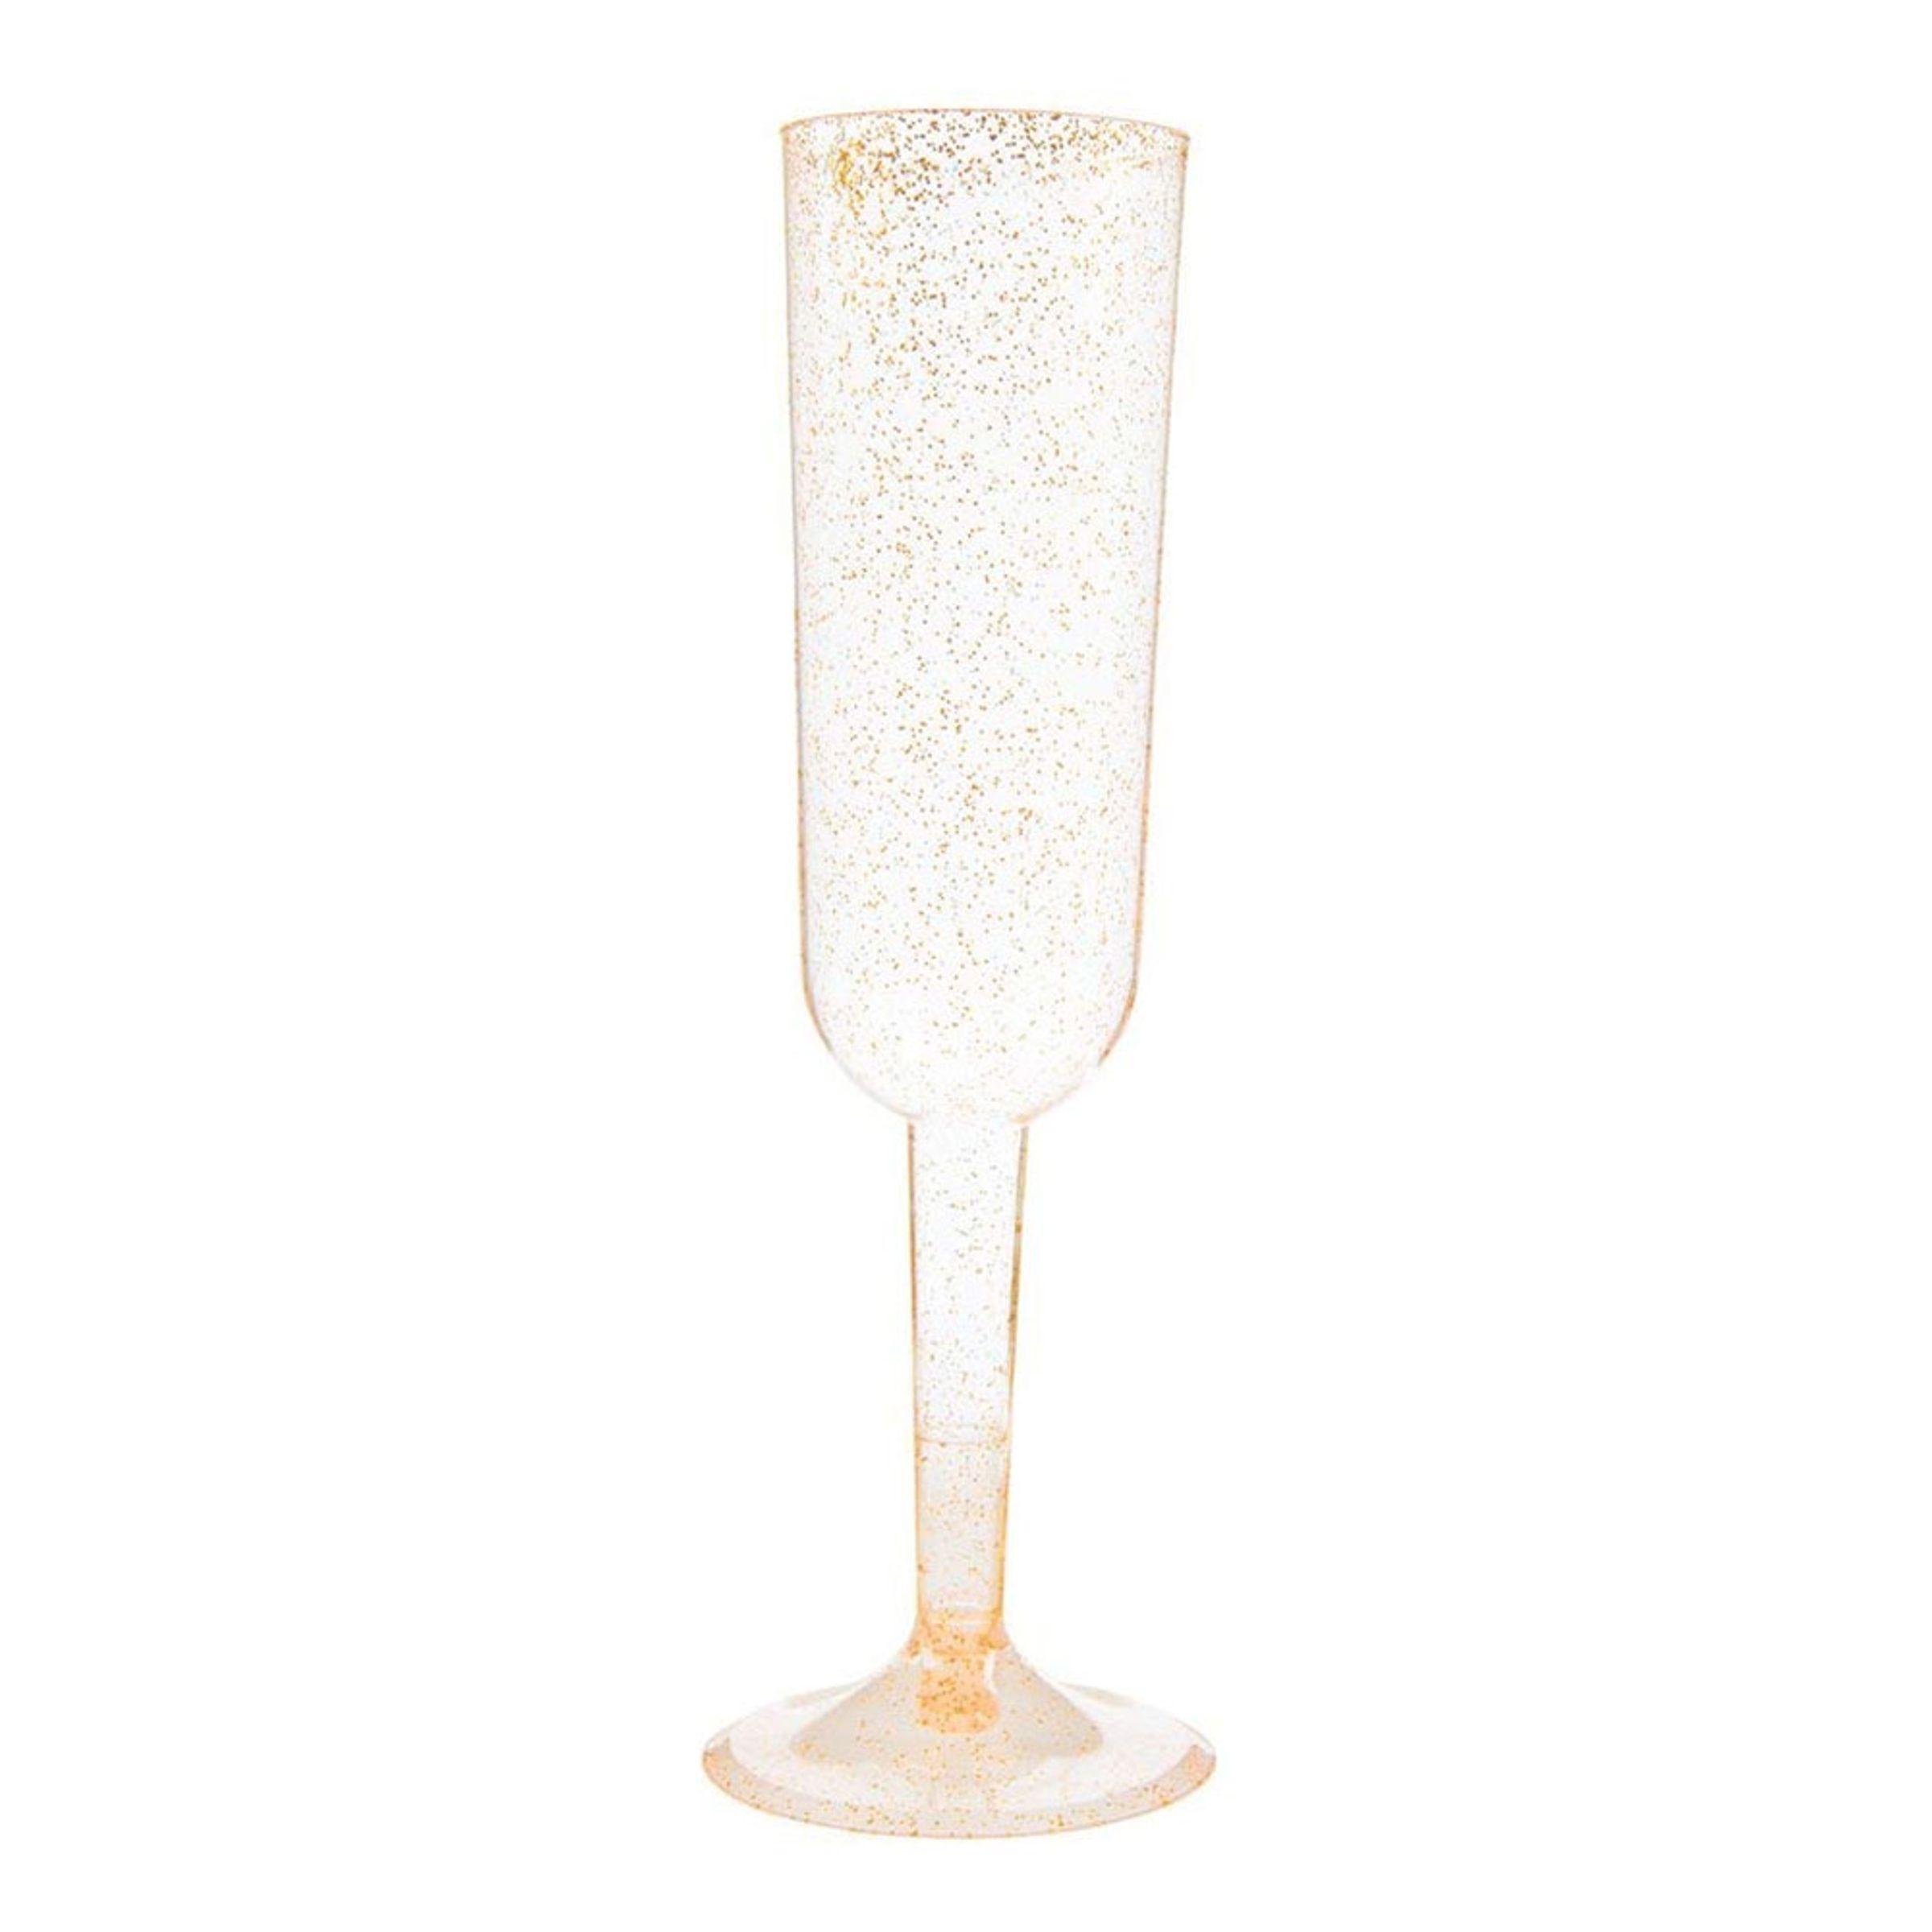 Champagneglas i Plast Guld Glitter - 4-pack